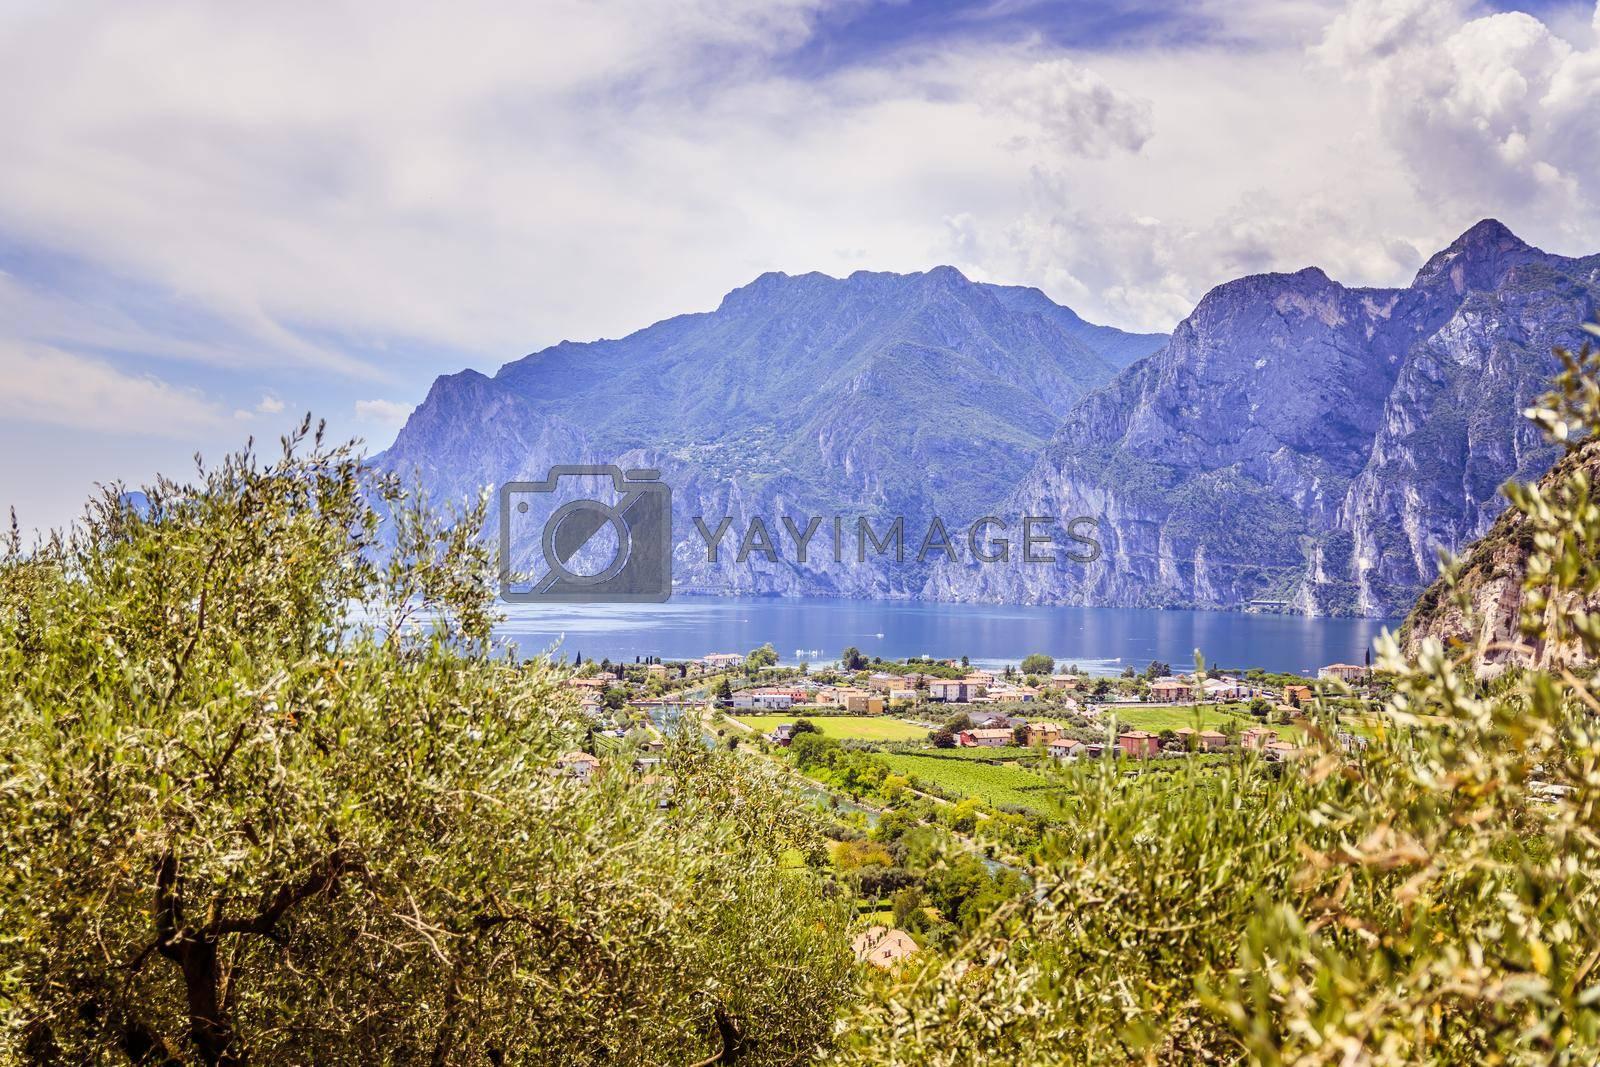 Mountains, nature and little village. Lake garda.